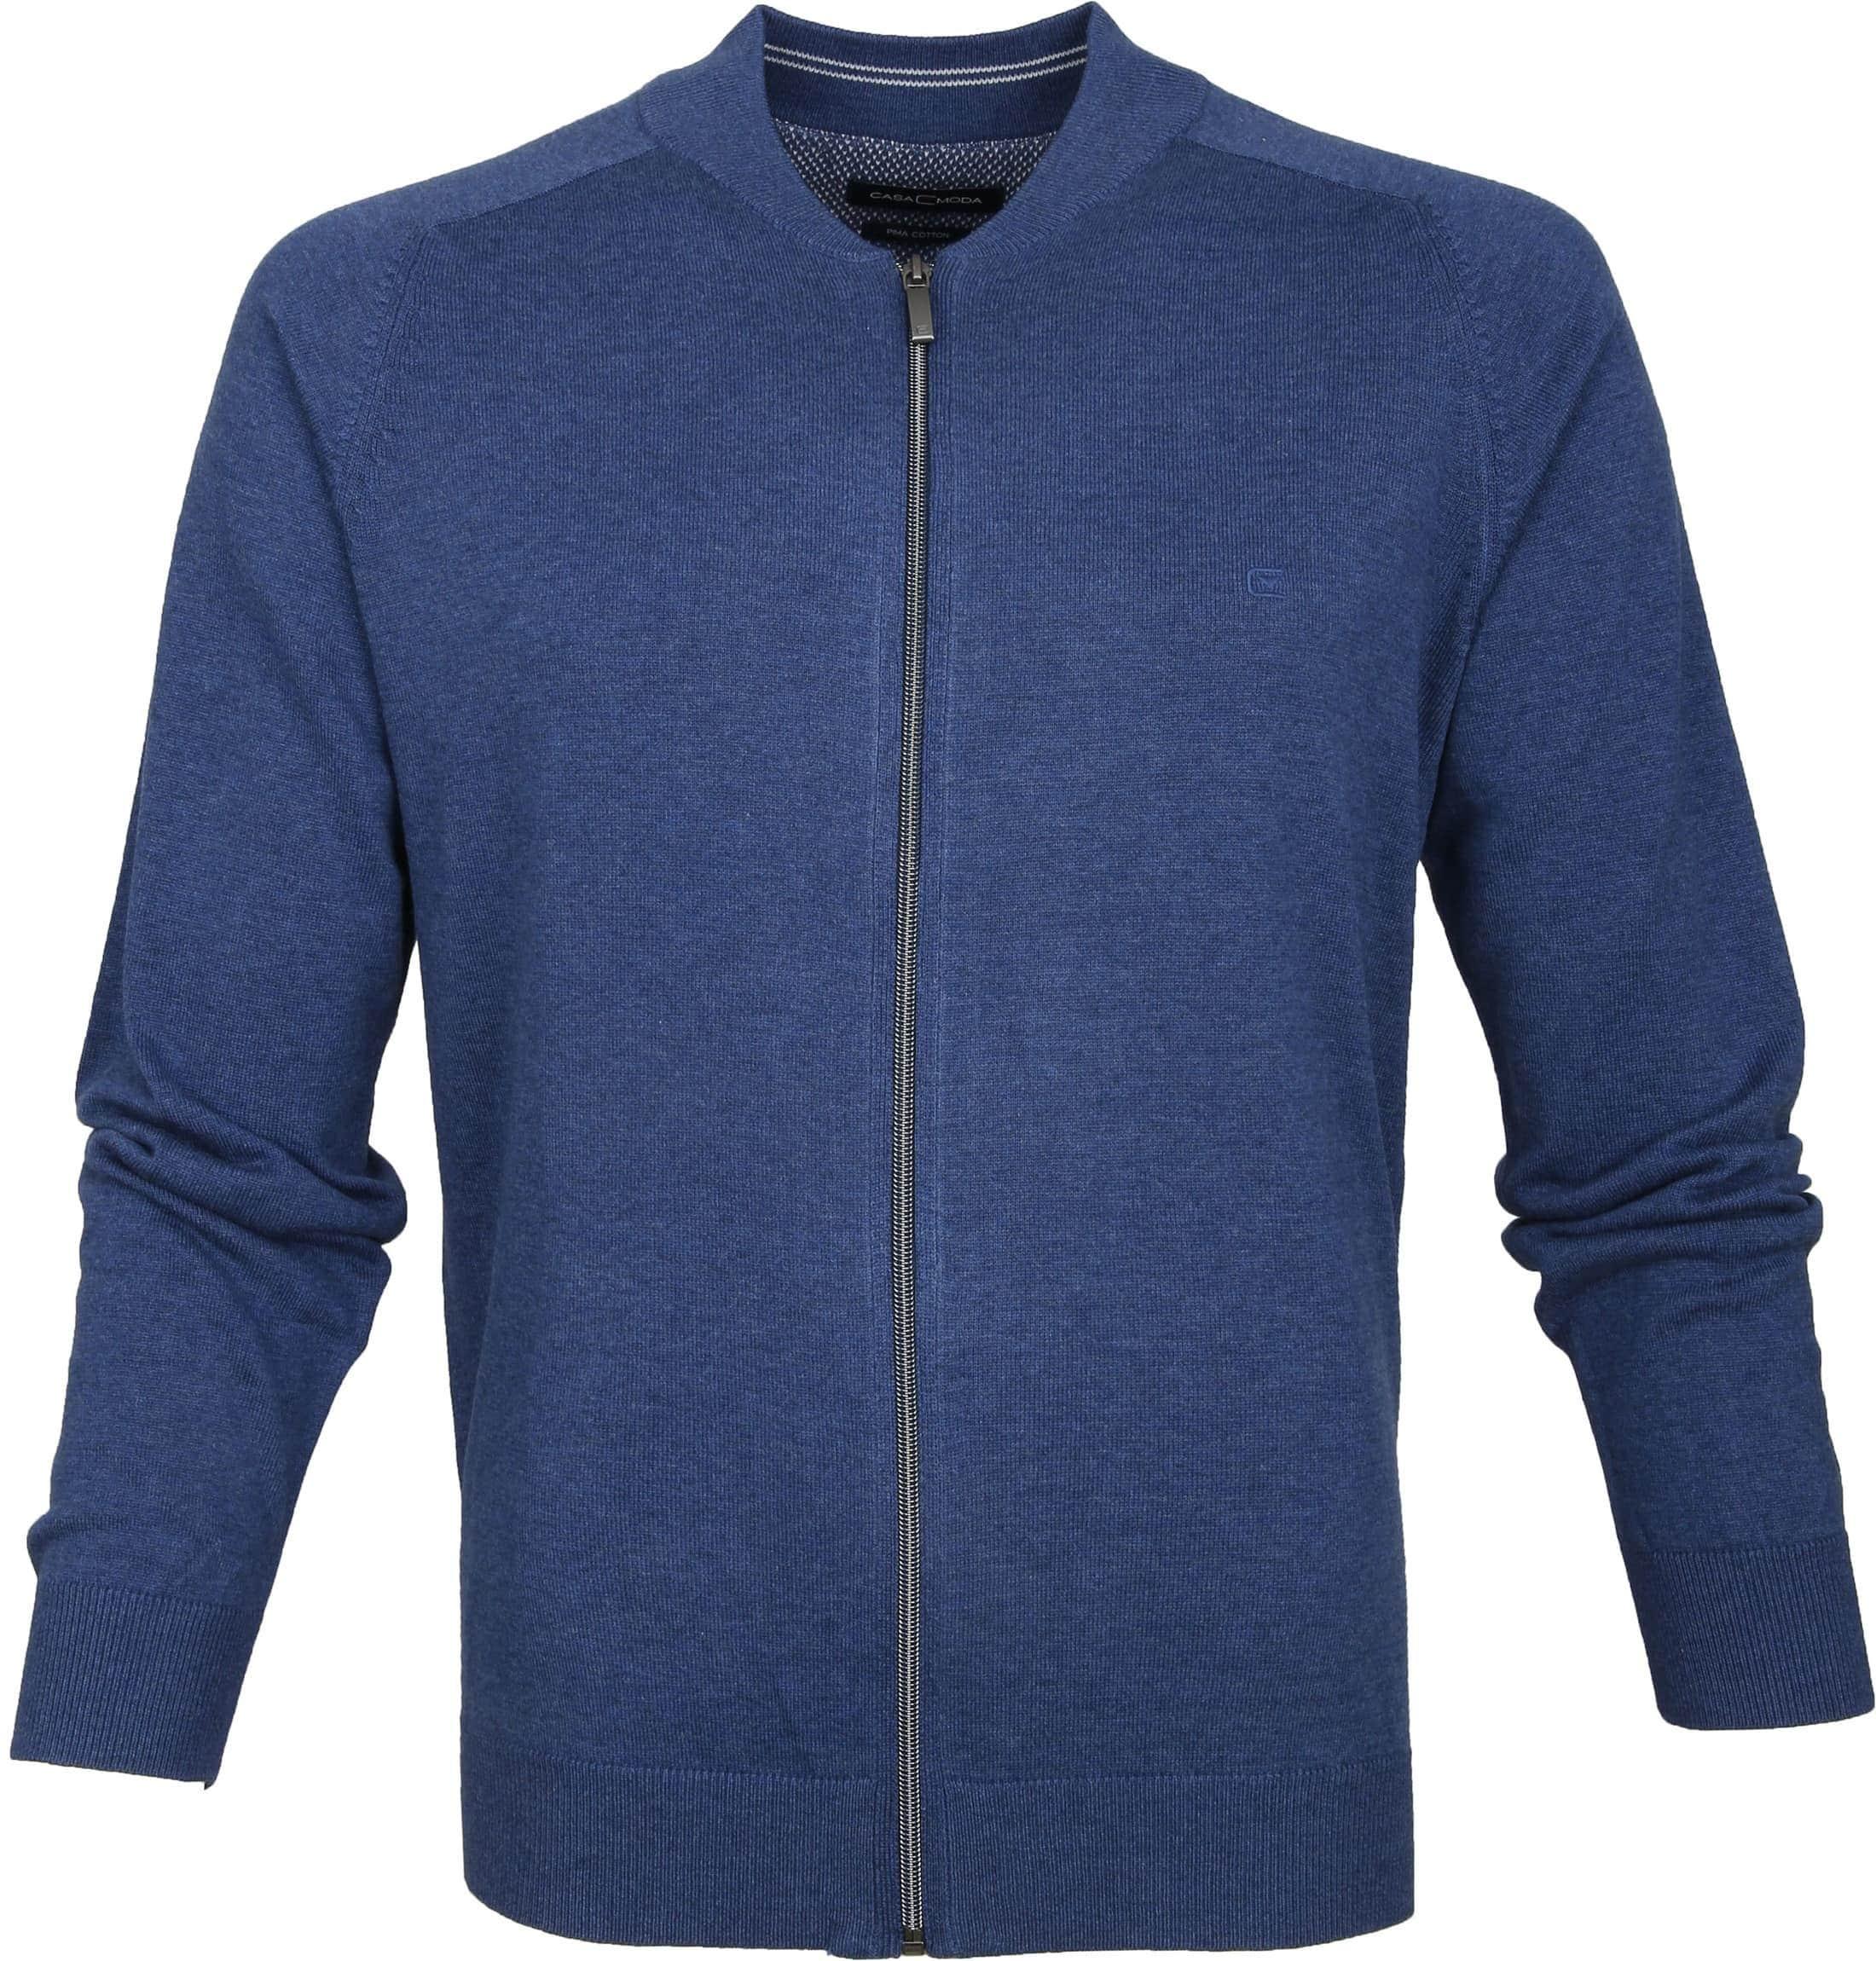 Casa Moda Strickjacke Zip Blau